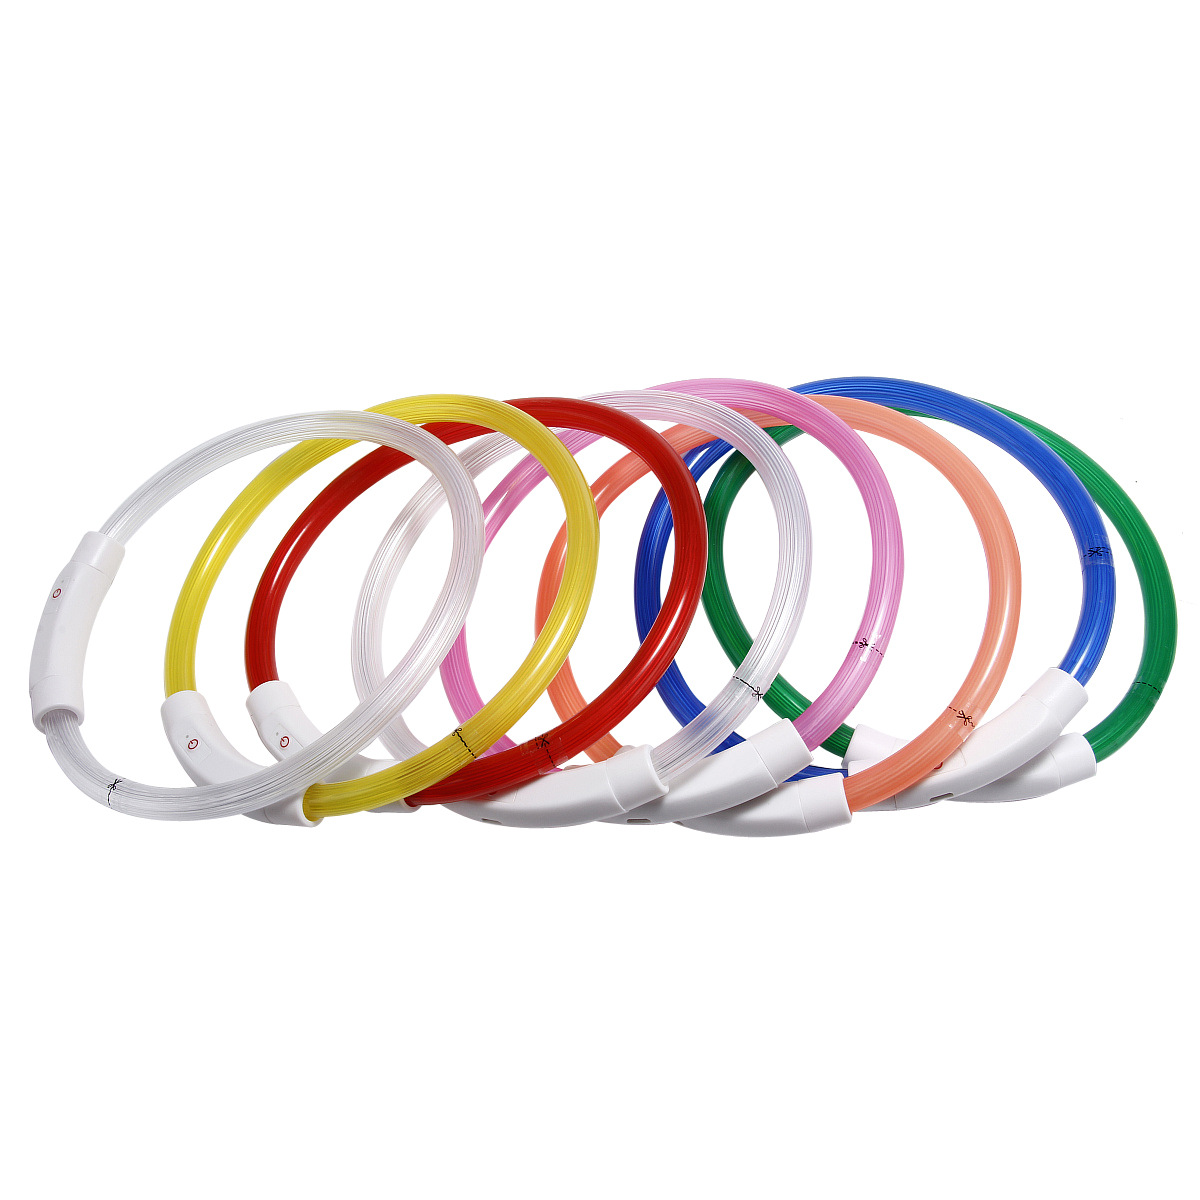 Pet Supplies DIY Multi-Color USB Charging Neck Ring LED Shining Dog Ye Quatrend